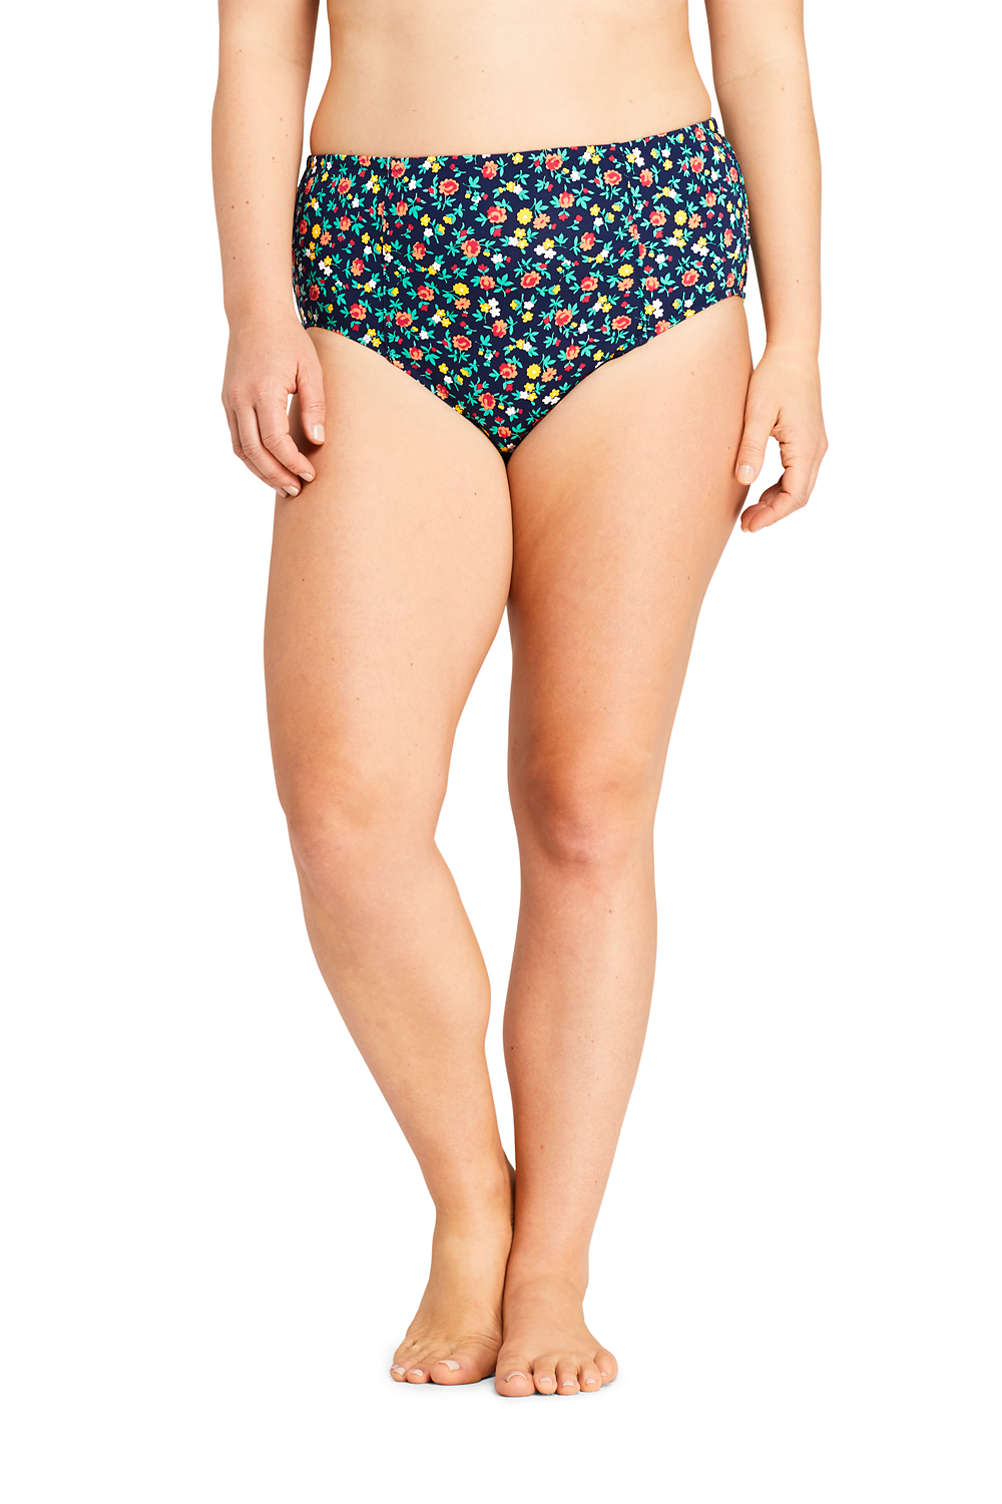 b184b842d69 Women s Plus Size Retro High Waisted Bikini Bottoms Print from Lands  End